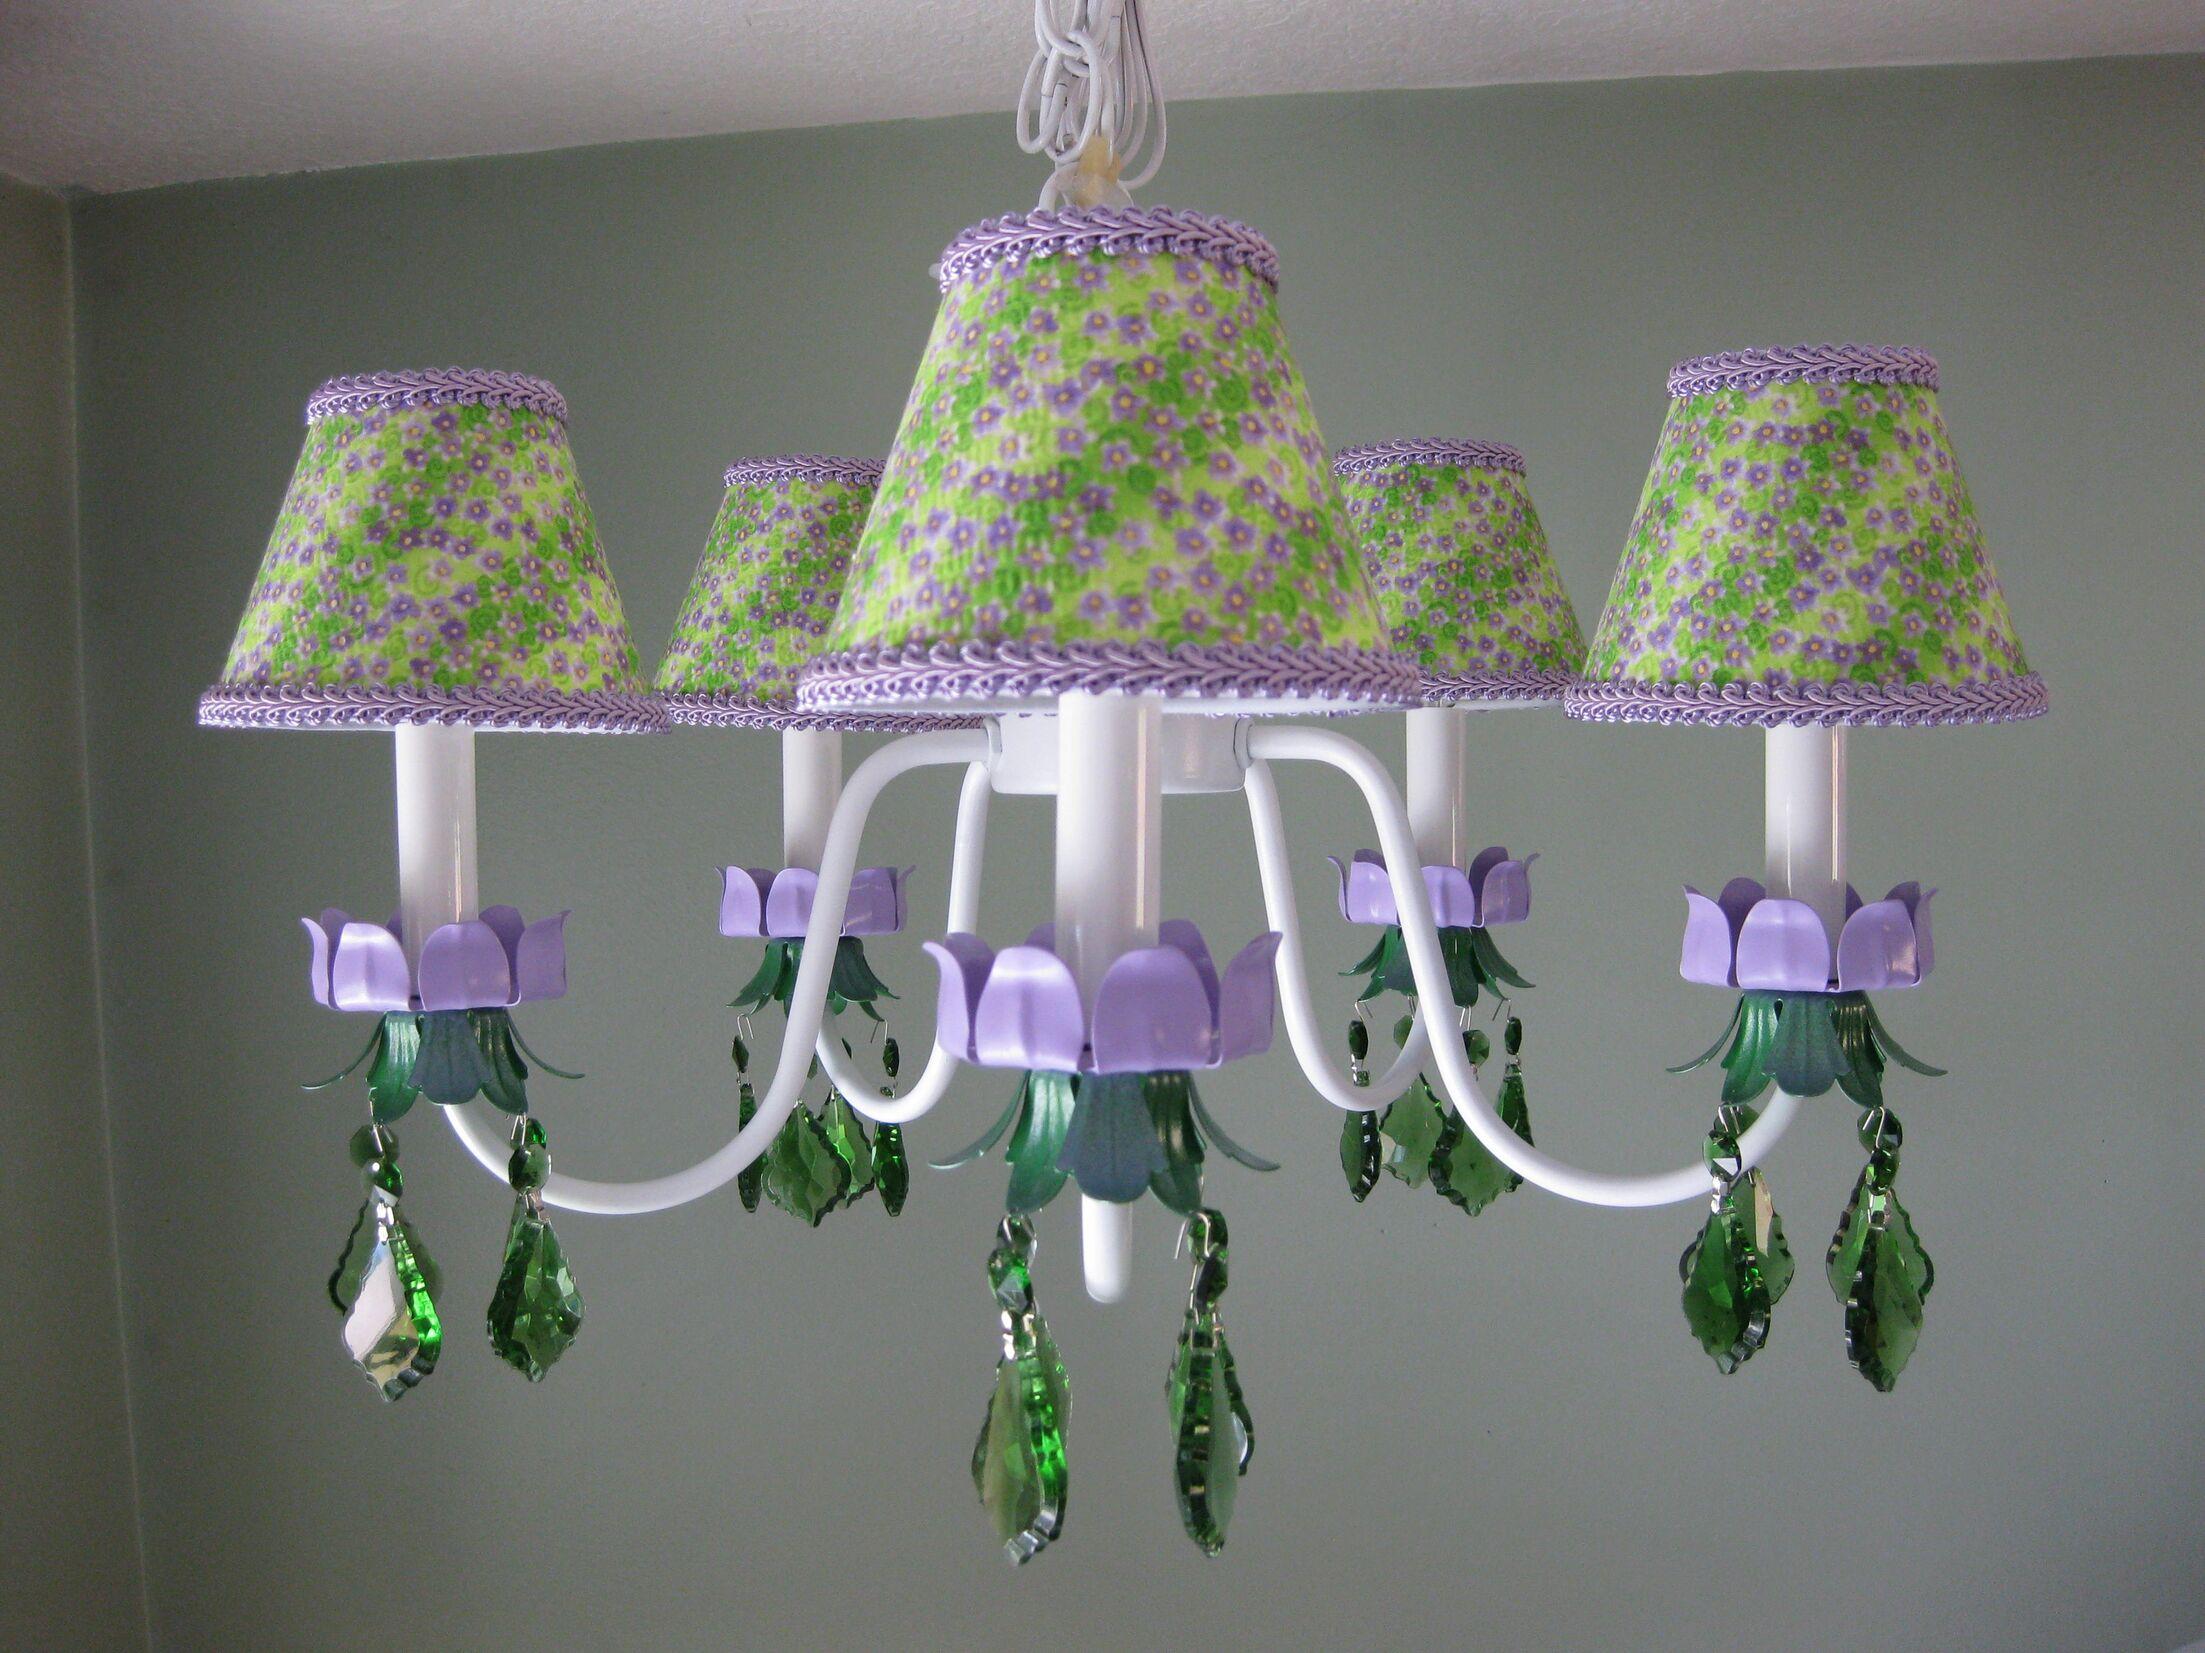 Lavender Fields 5-Light Shaded Chandelier Shade: Lavender Fields